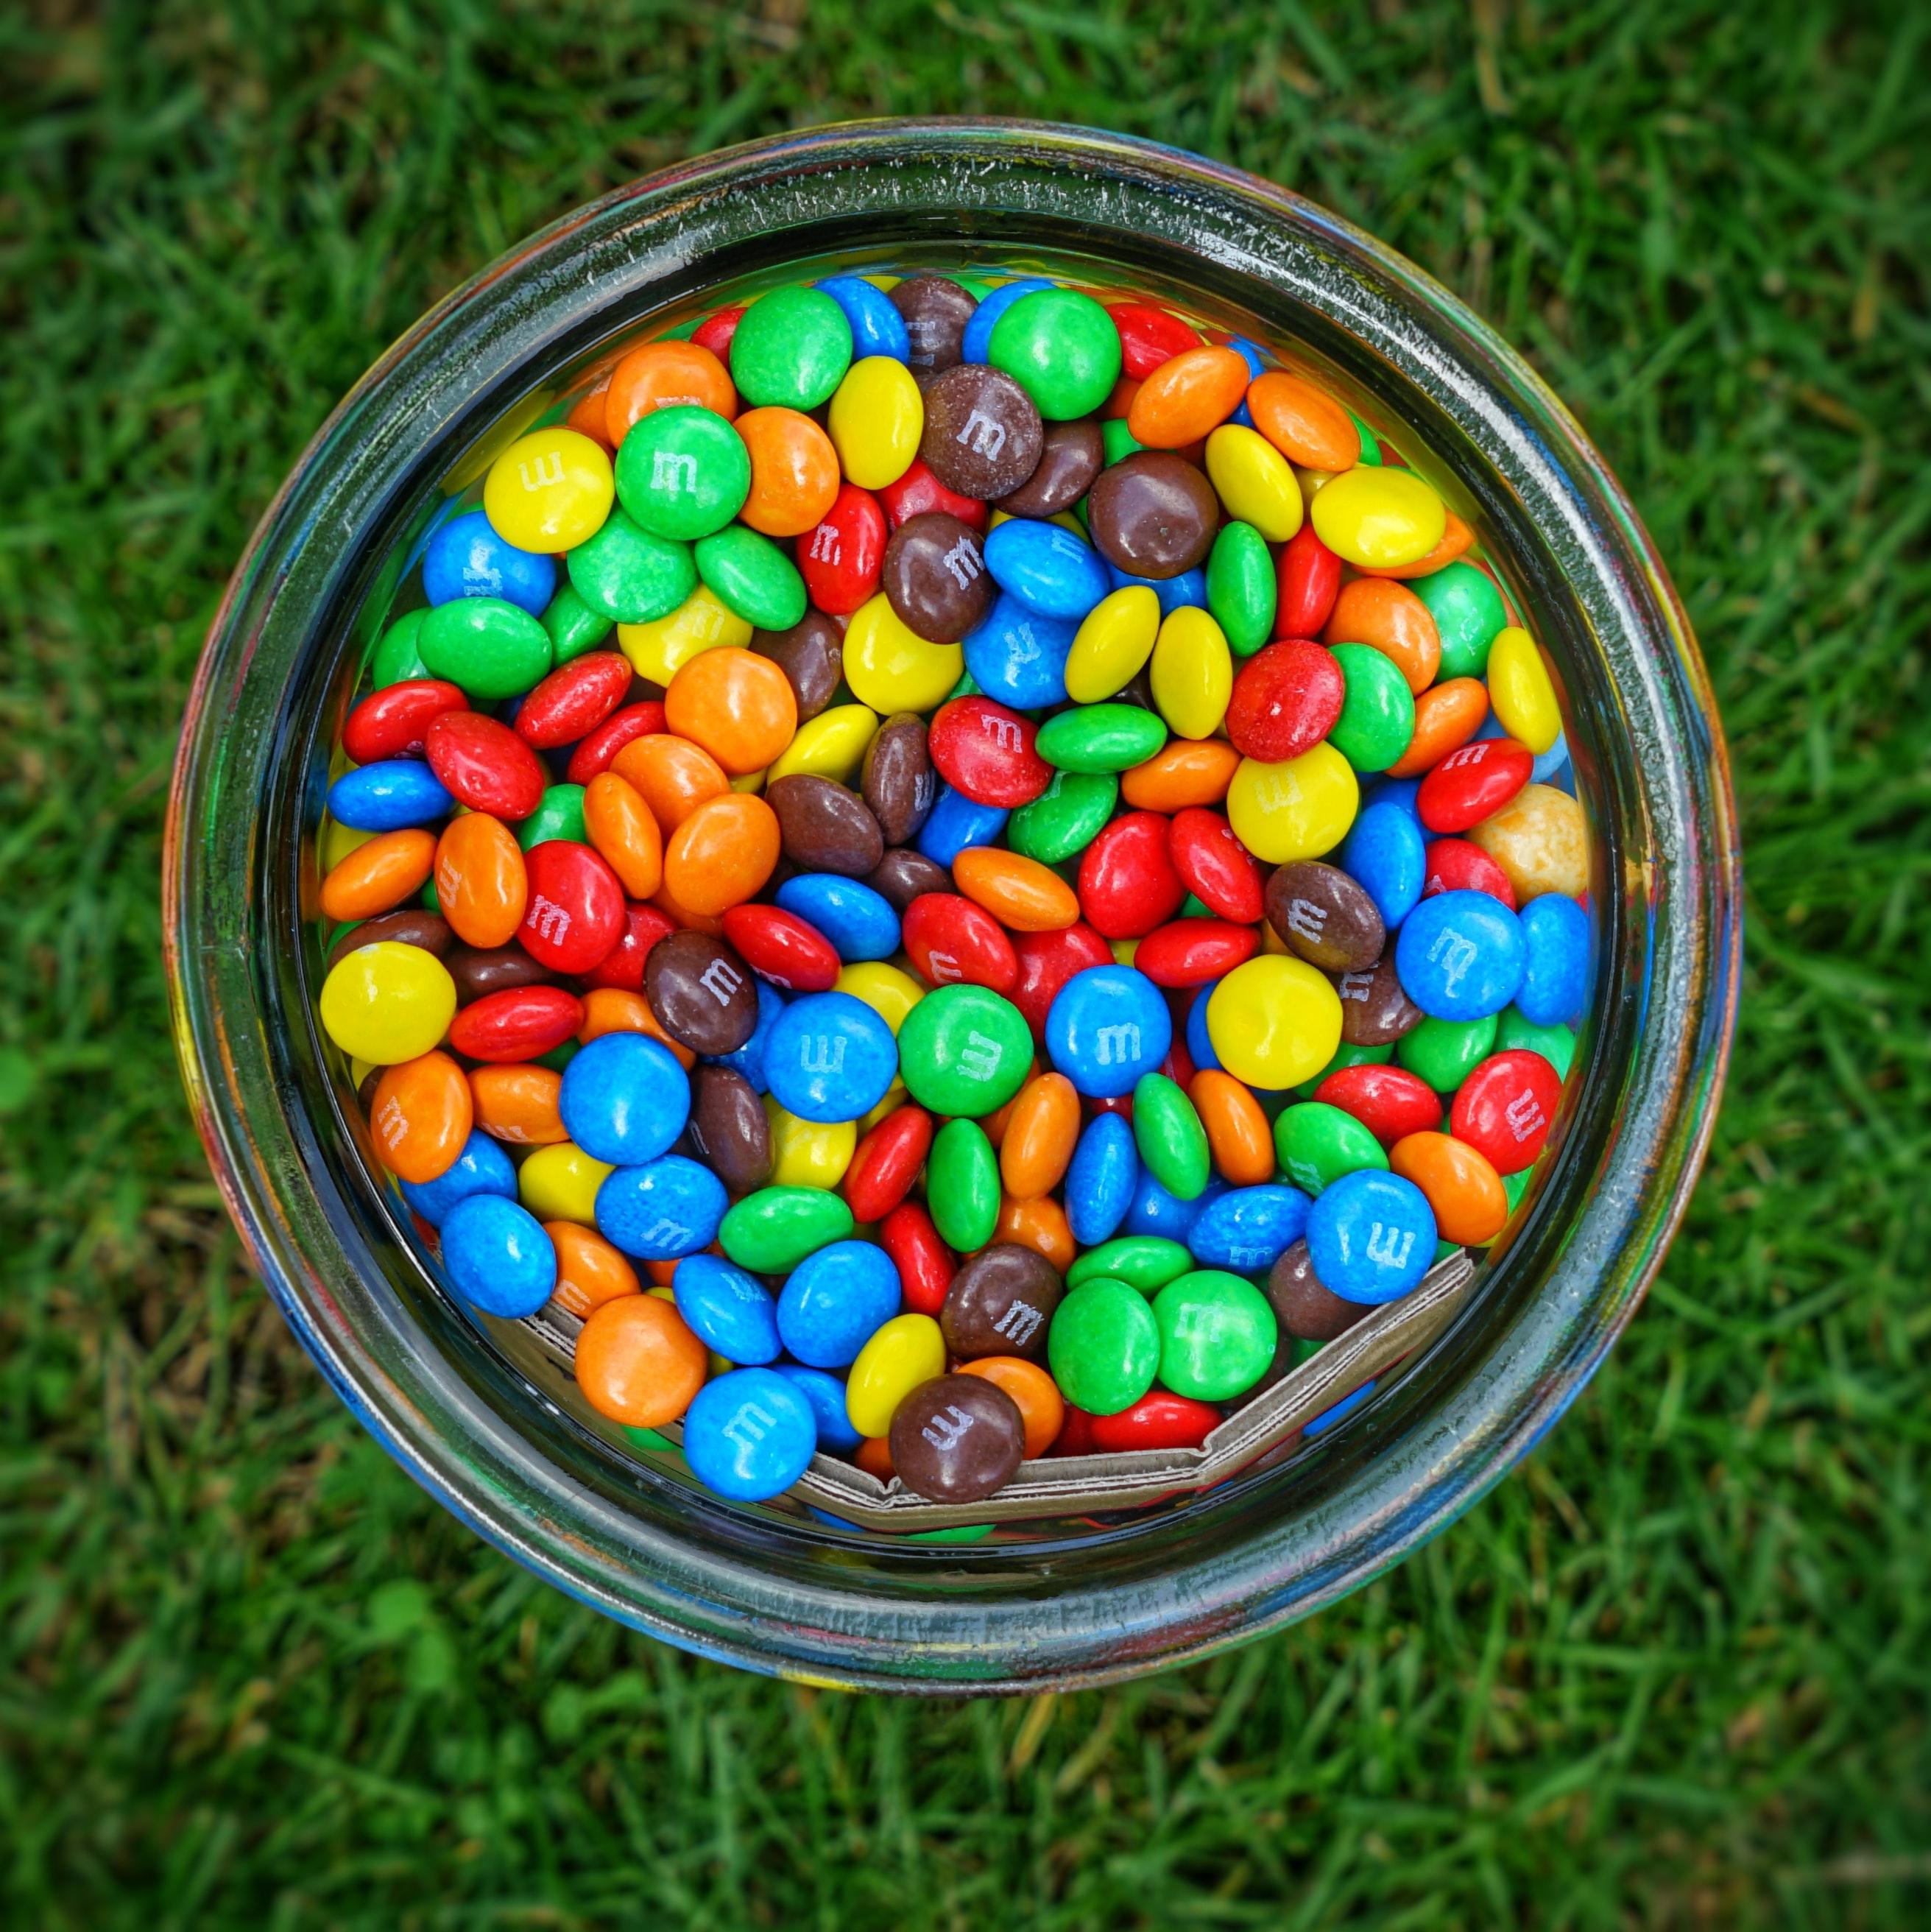 Confectionery - Novelty